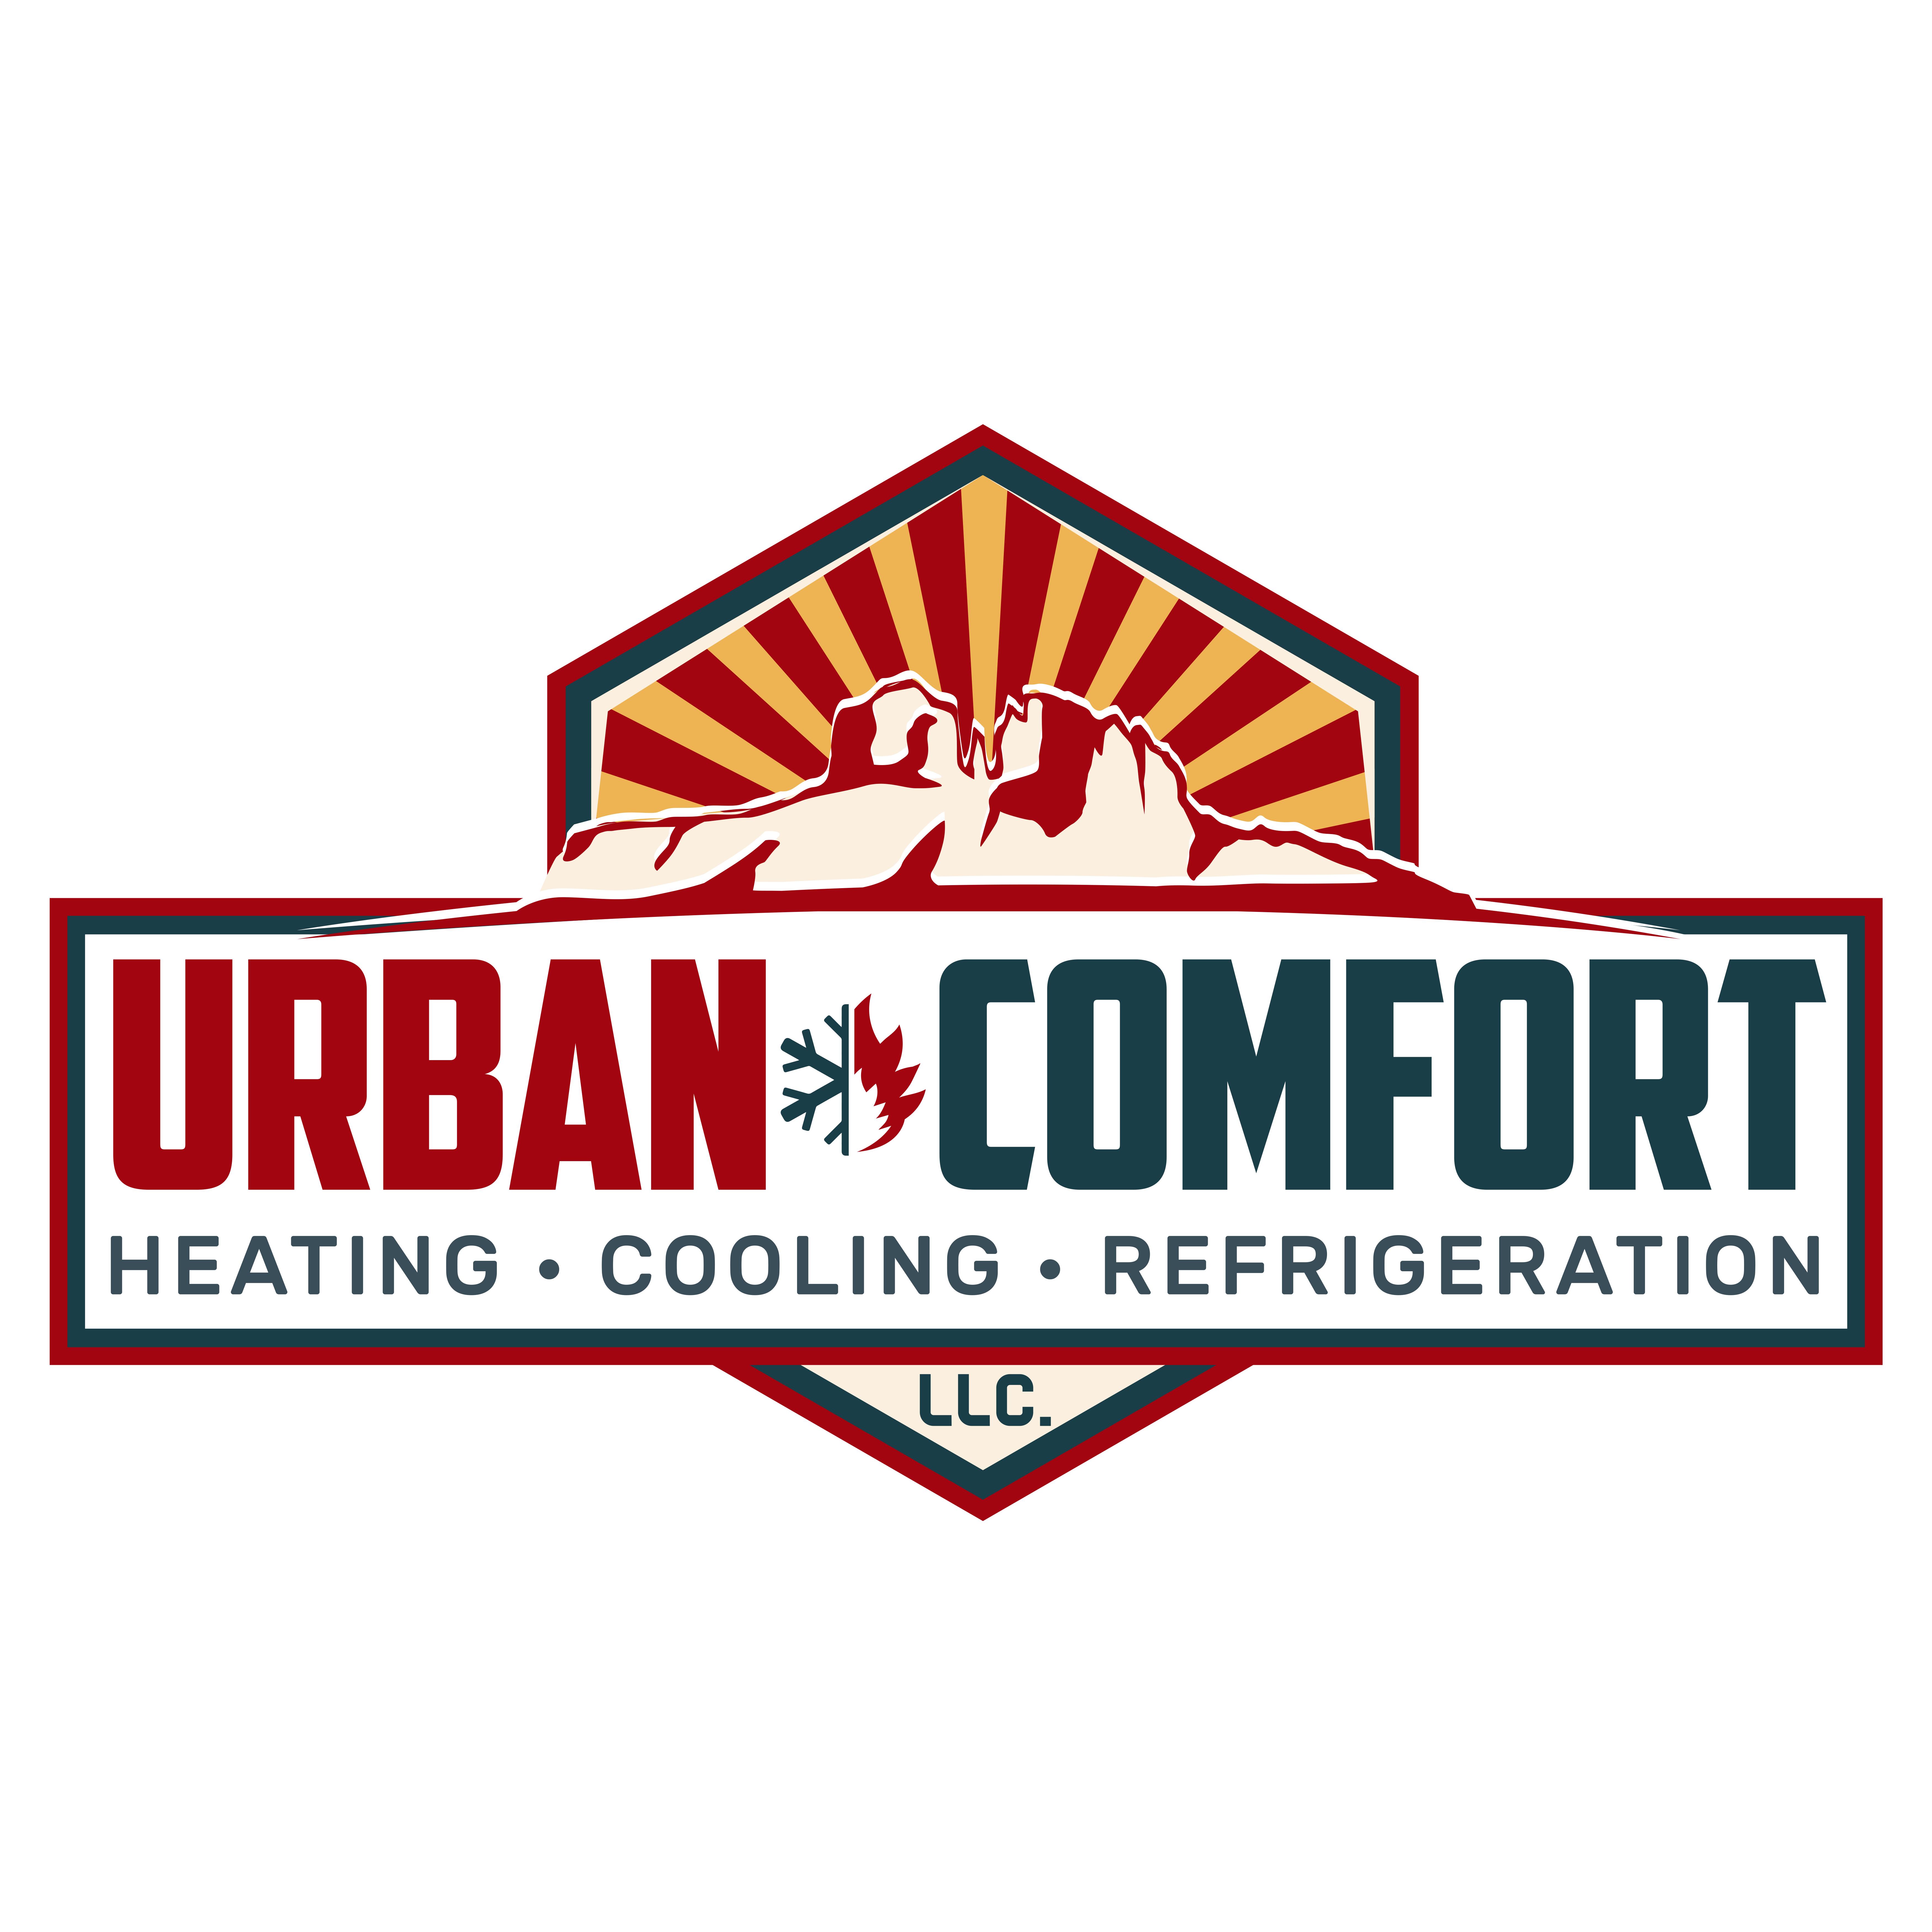 Urban comfort llc mesa arizona az for Red mountain motors mesa az